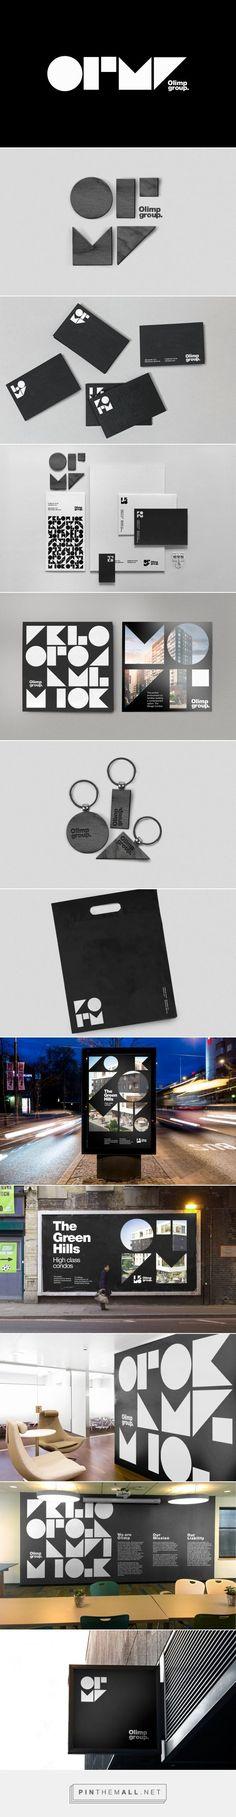 Olimp Group Real Estate Developer Branding by Stepan Solodkov | Fivestar Branding Agency – Design and Branding Agency & Curated Inspiration Gallery #realestatebranding